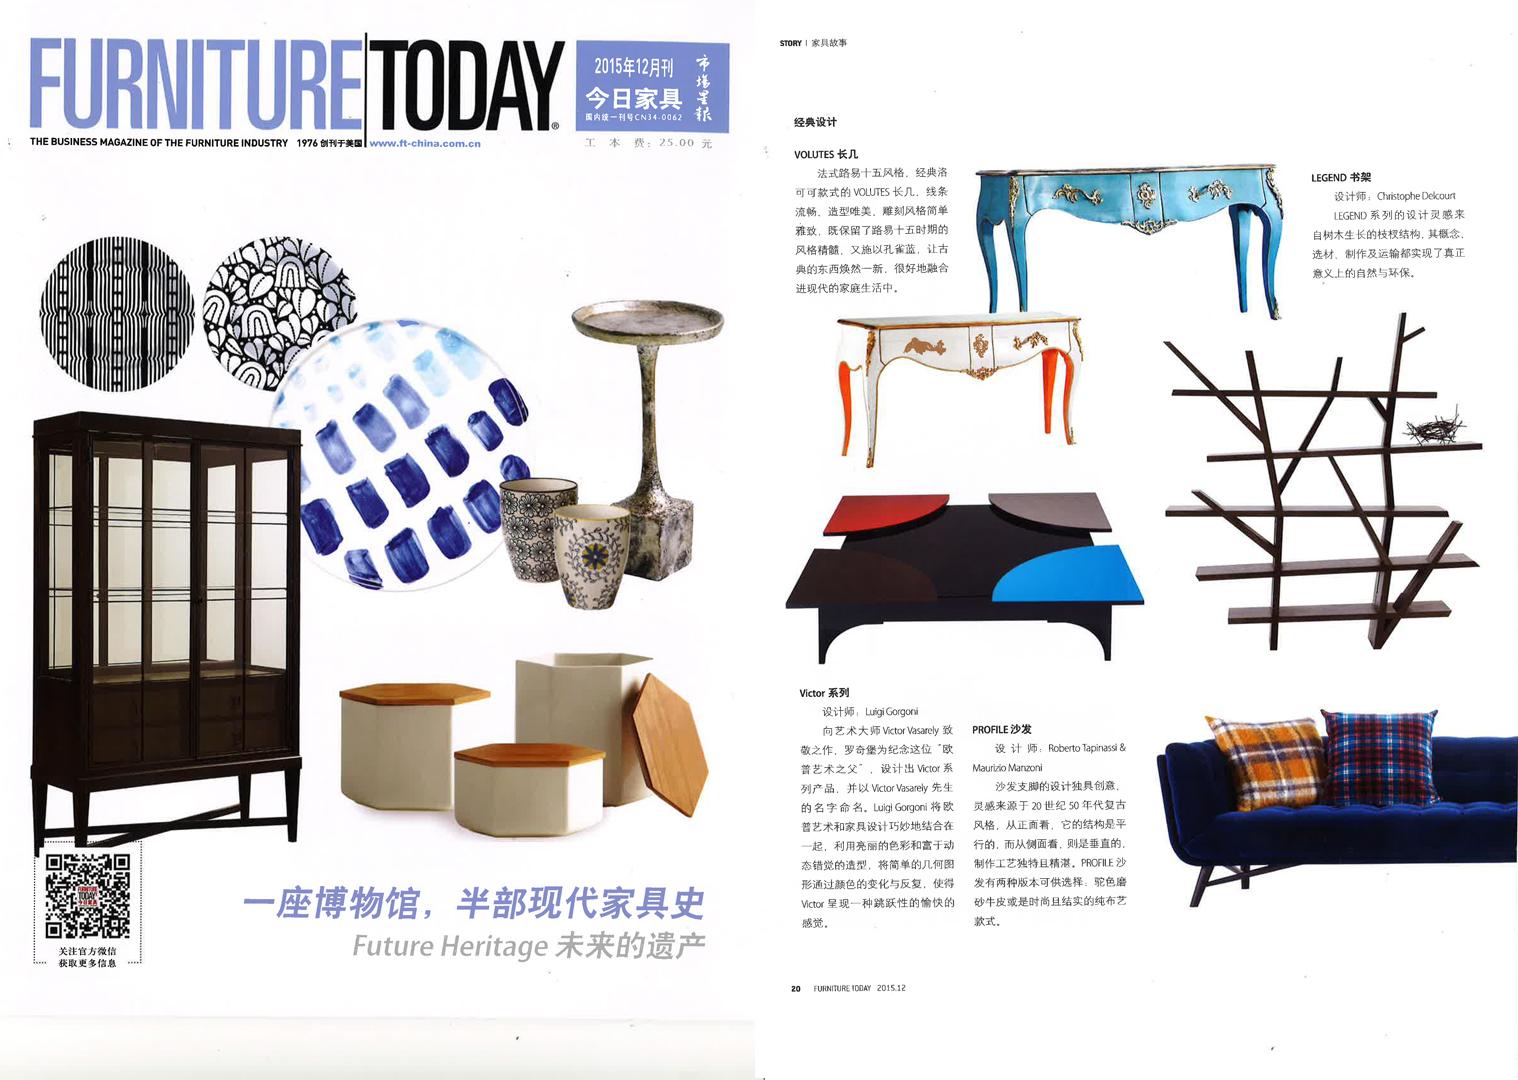 furniture design - dicembre 20152